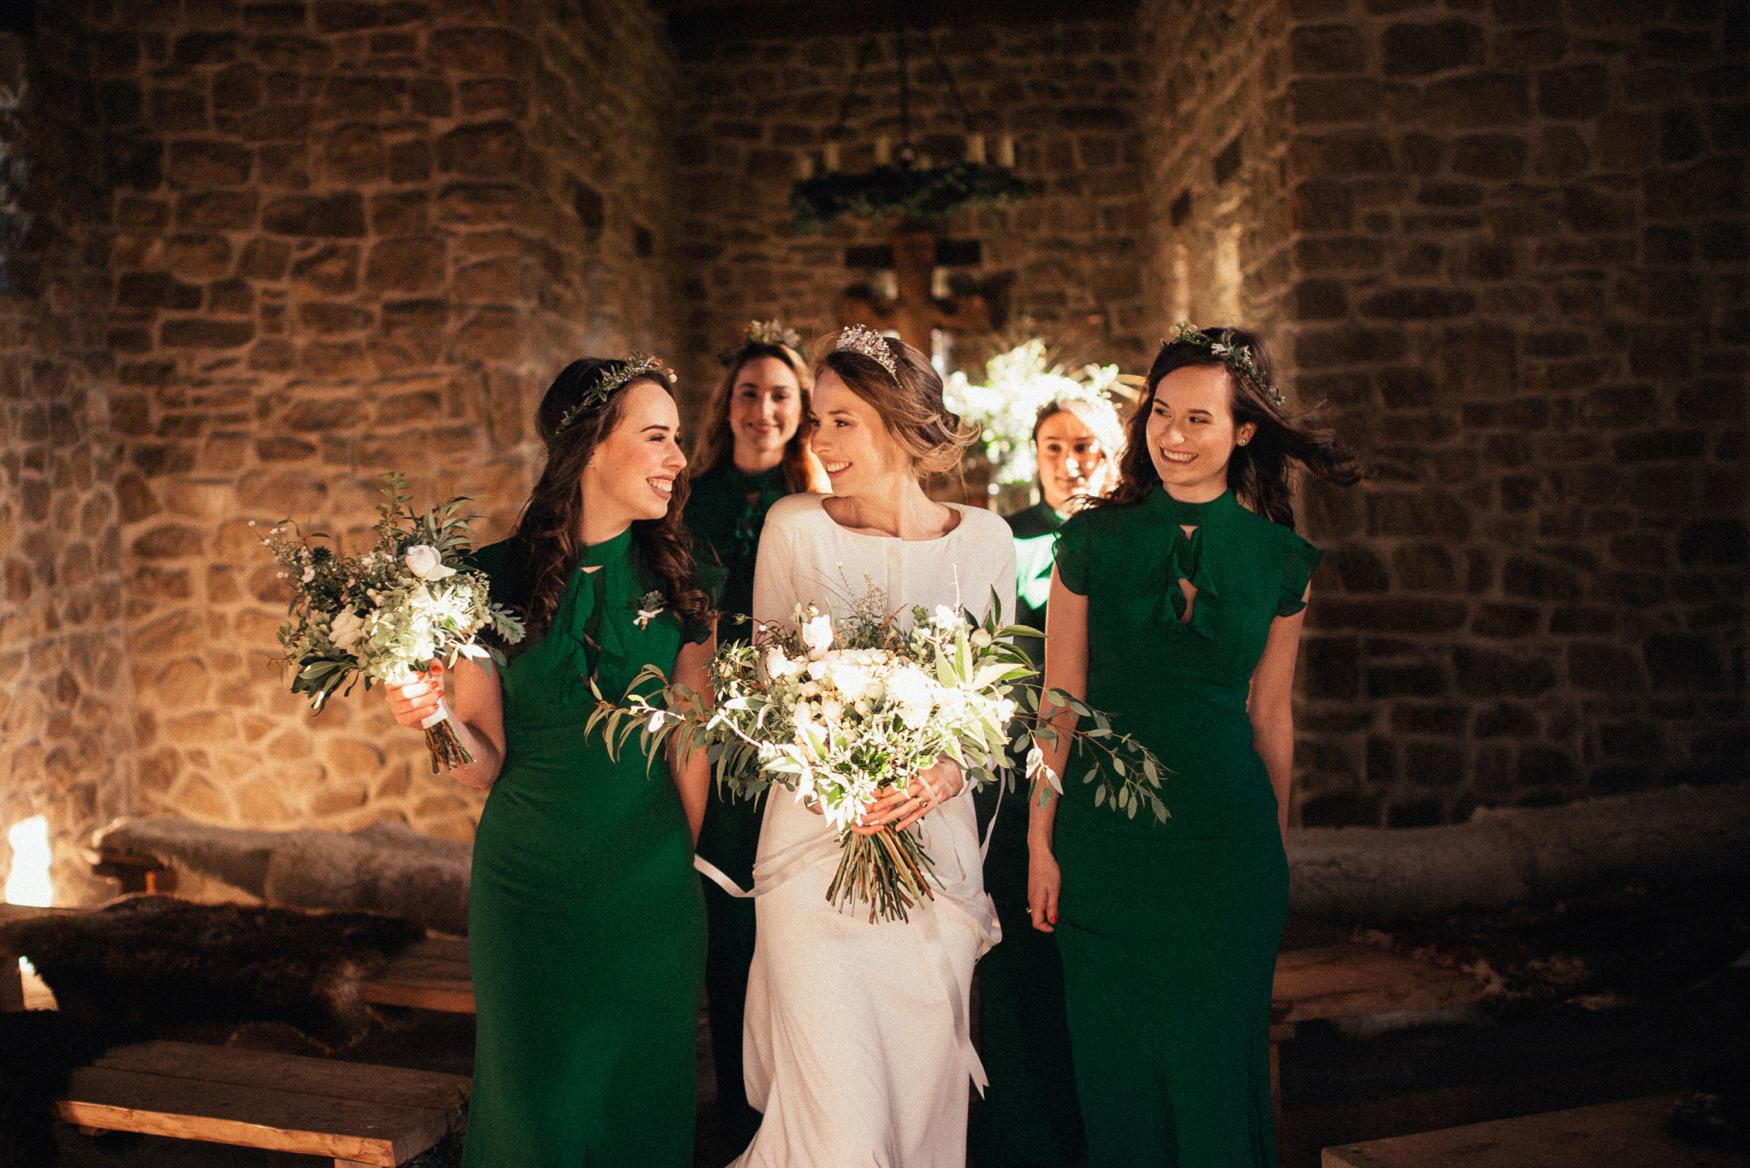 2 prague wedding photographer - boho svatba zikmundov033.jpg